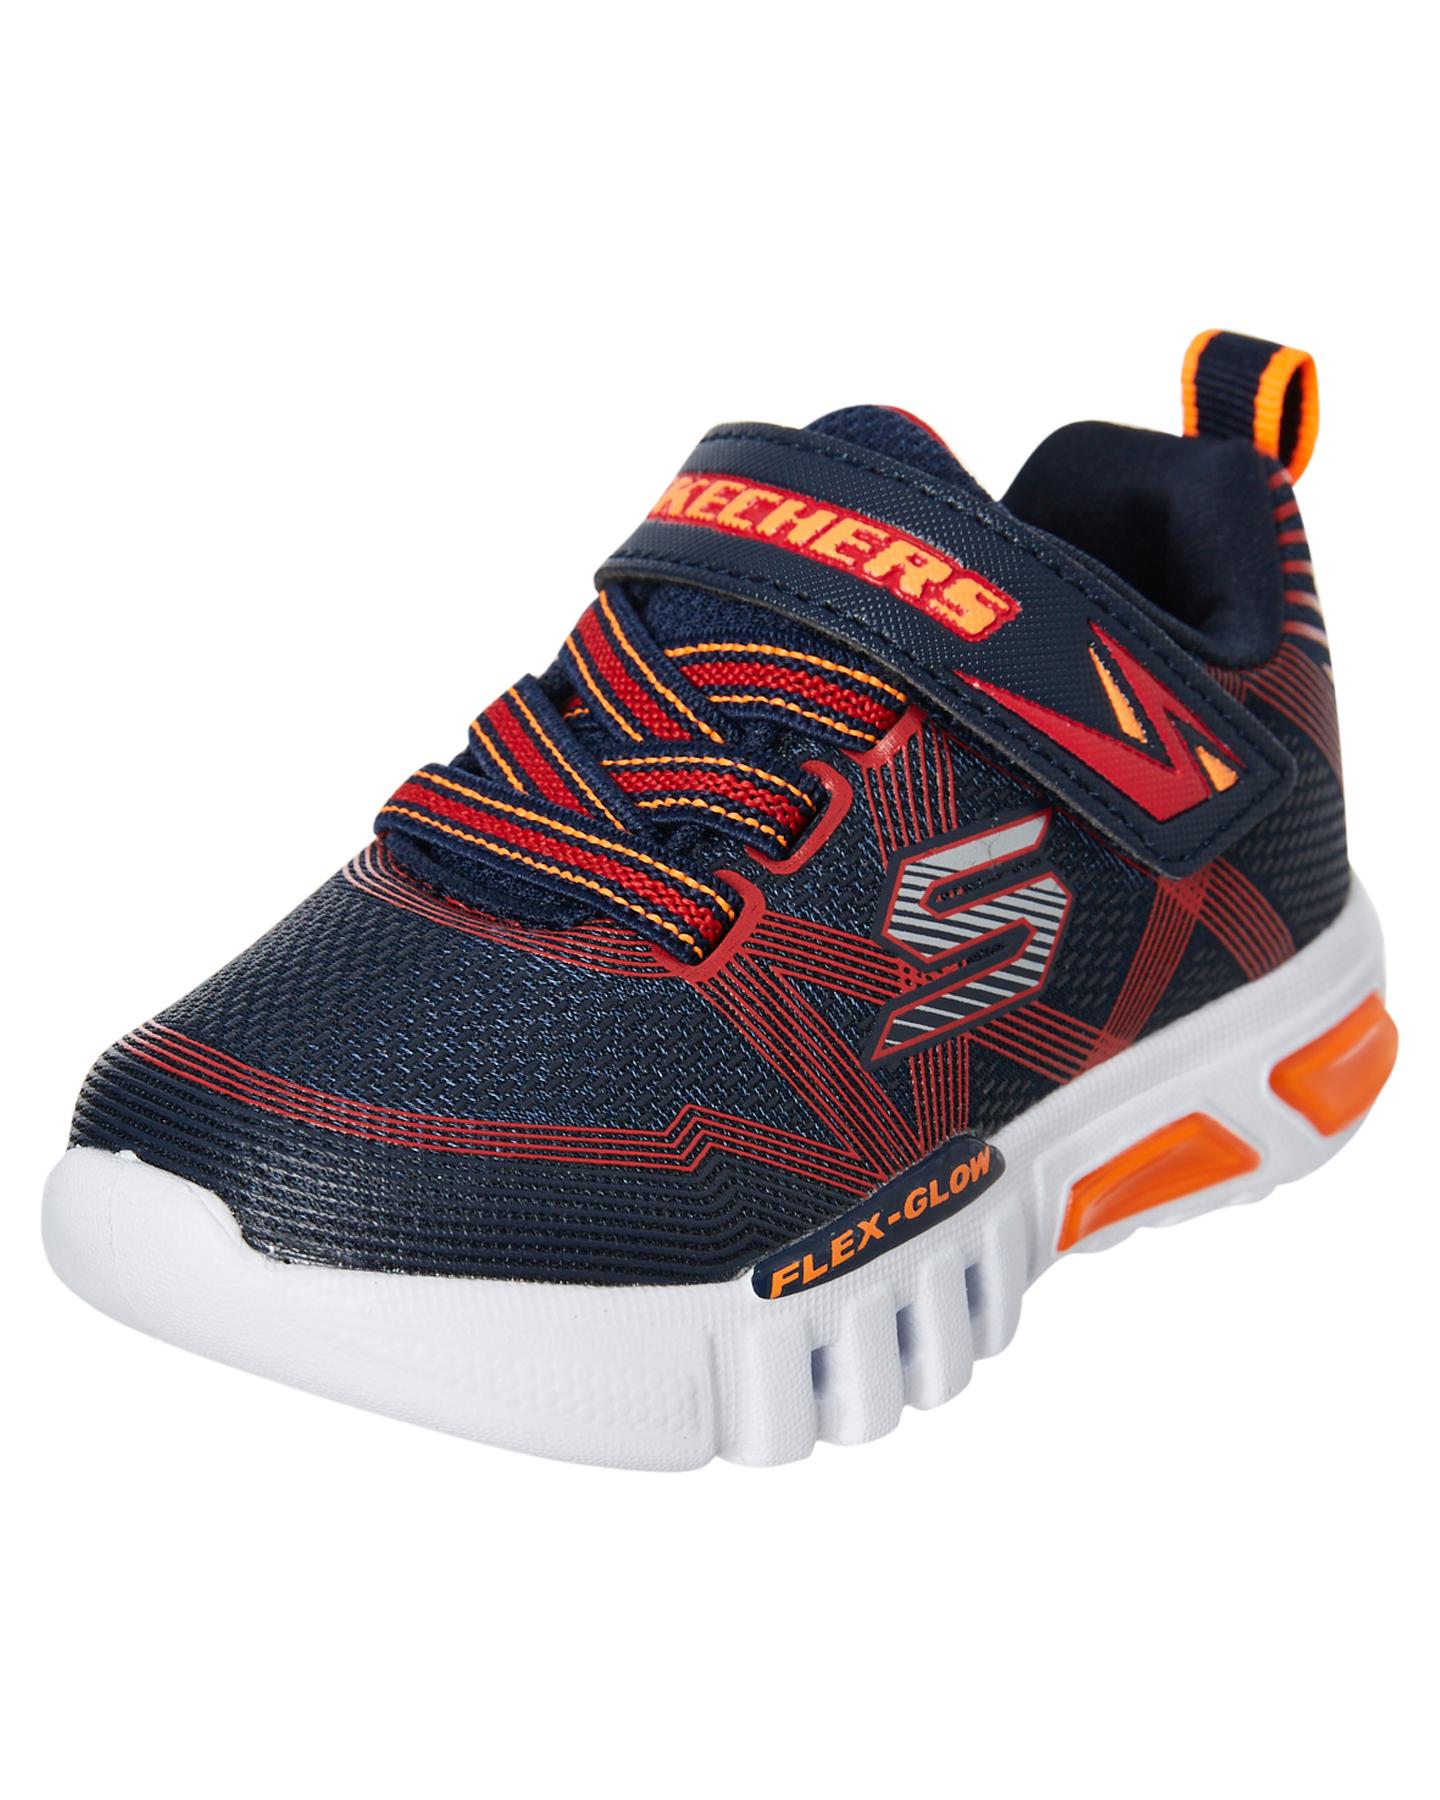 Skechers-Boys-Tots-Boys-Flex-Glow-Shoe-Lace-Mesh-Blue thumbnail 15